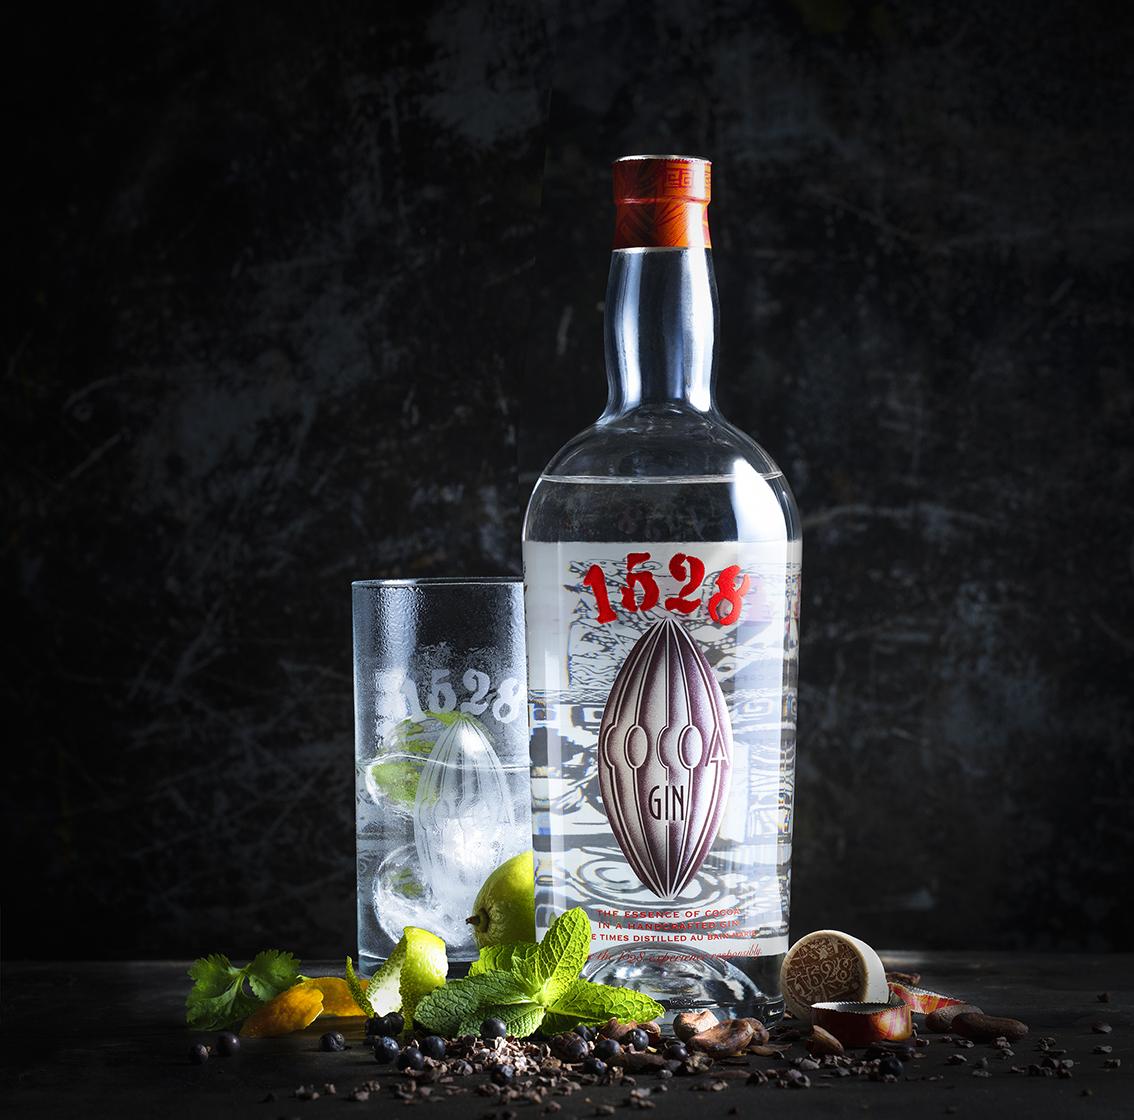 Cocoa Gin 1528